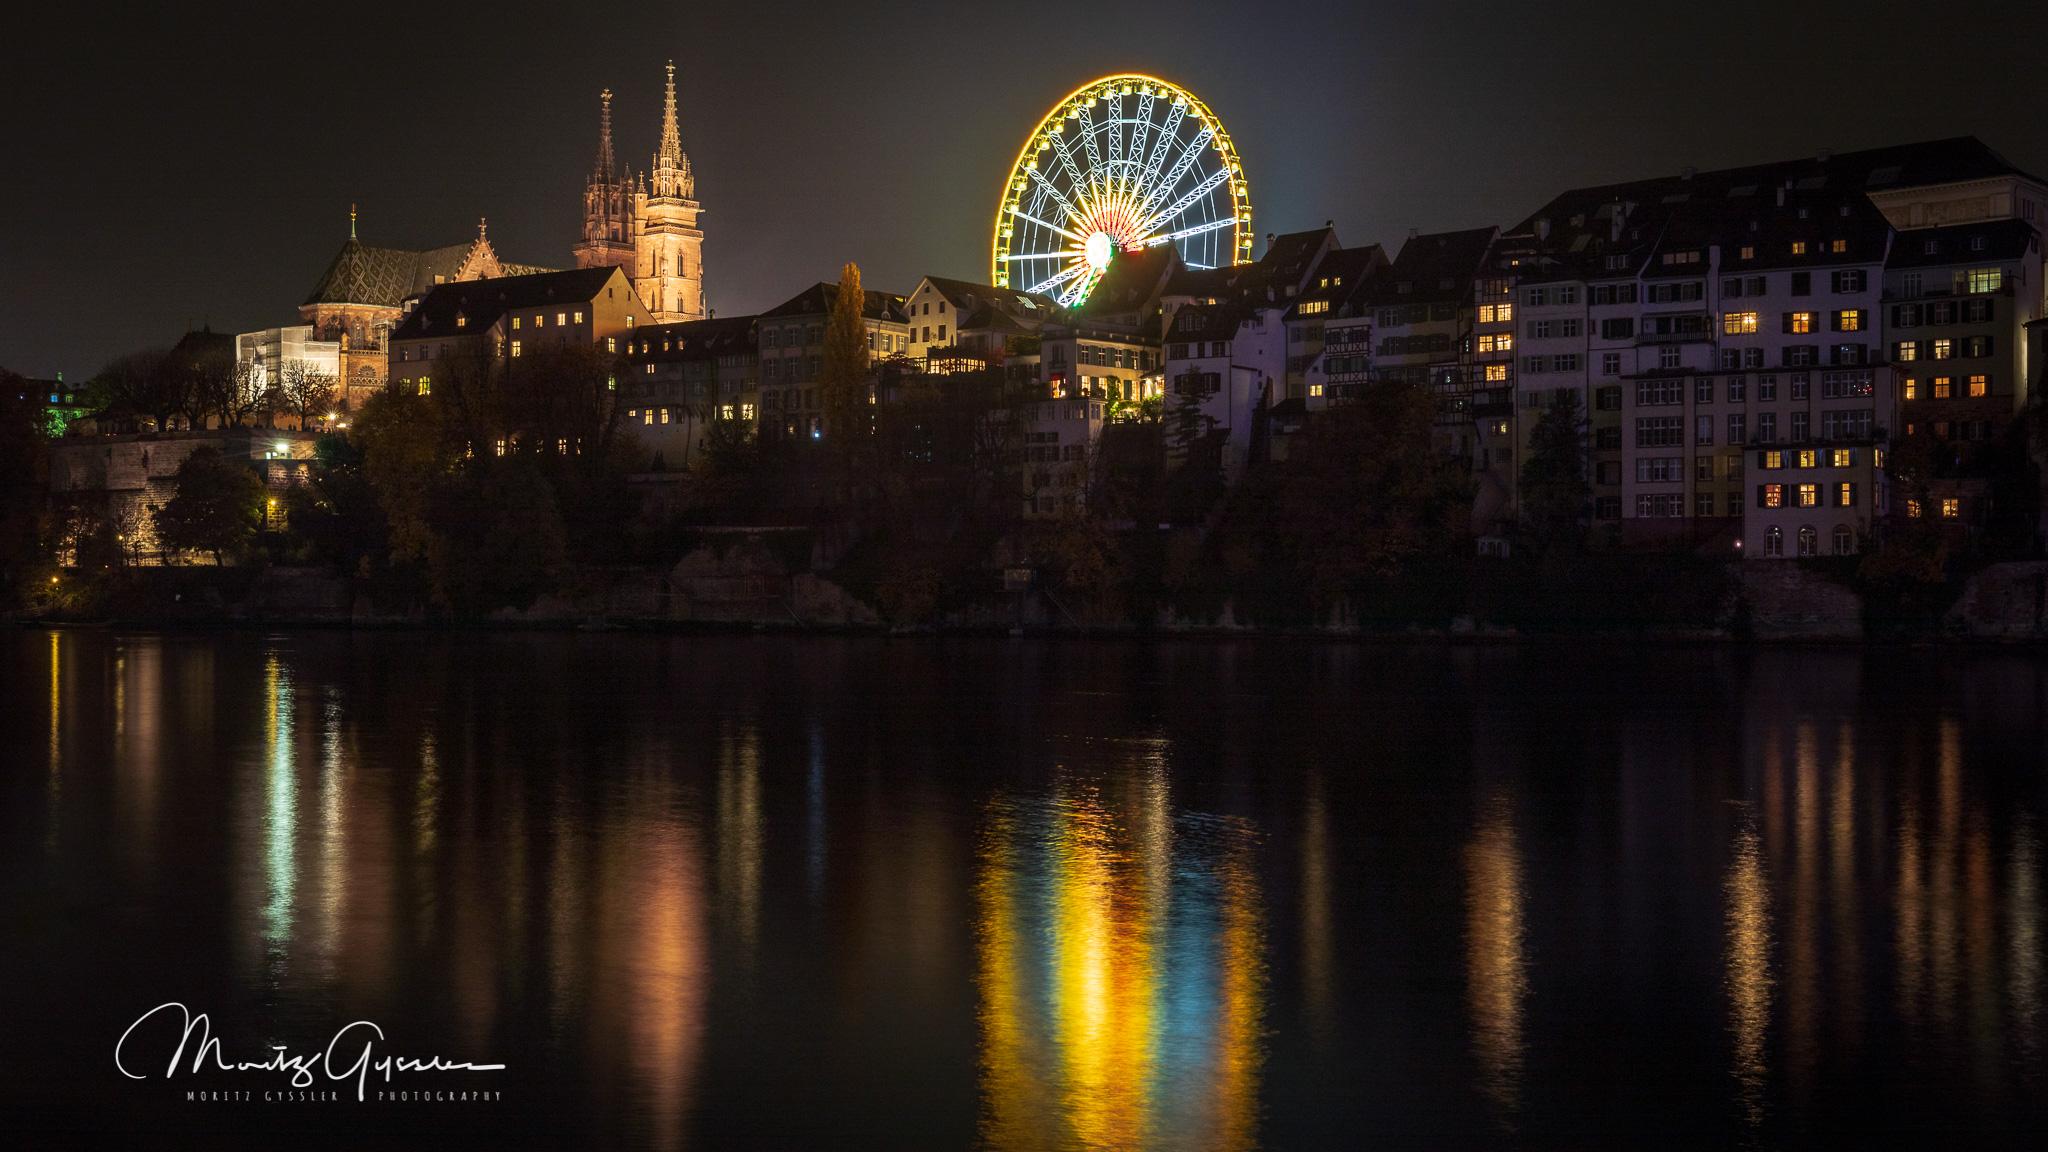 Autumn Fair, Switzerland